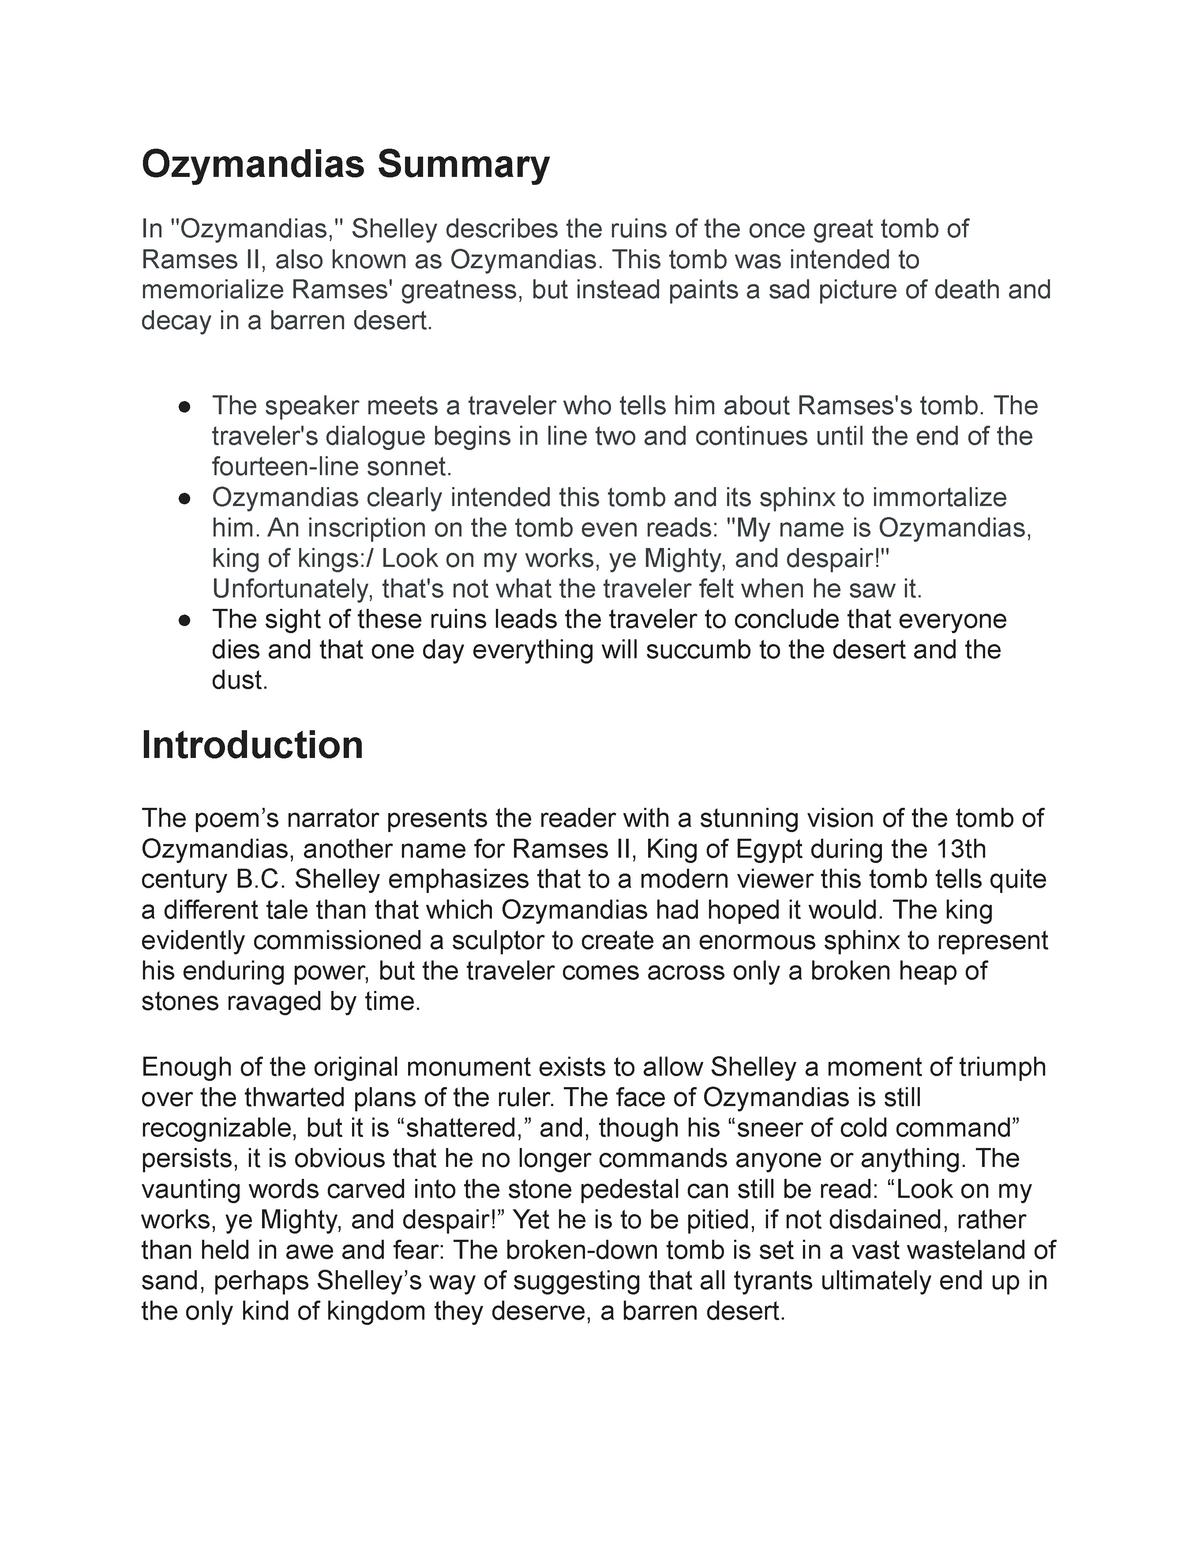 Ozymandia Summary Studocu Of The Poem By Shelley